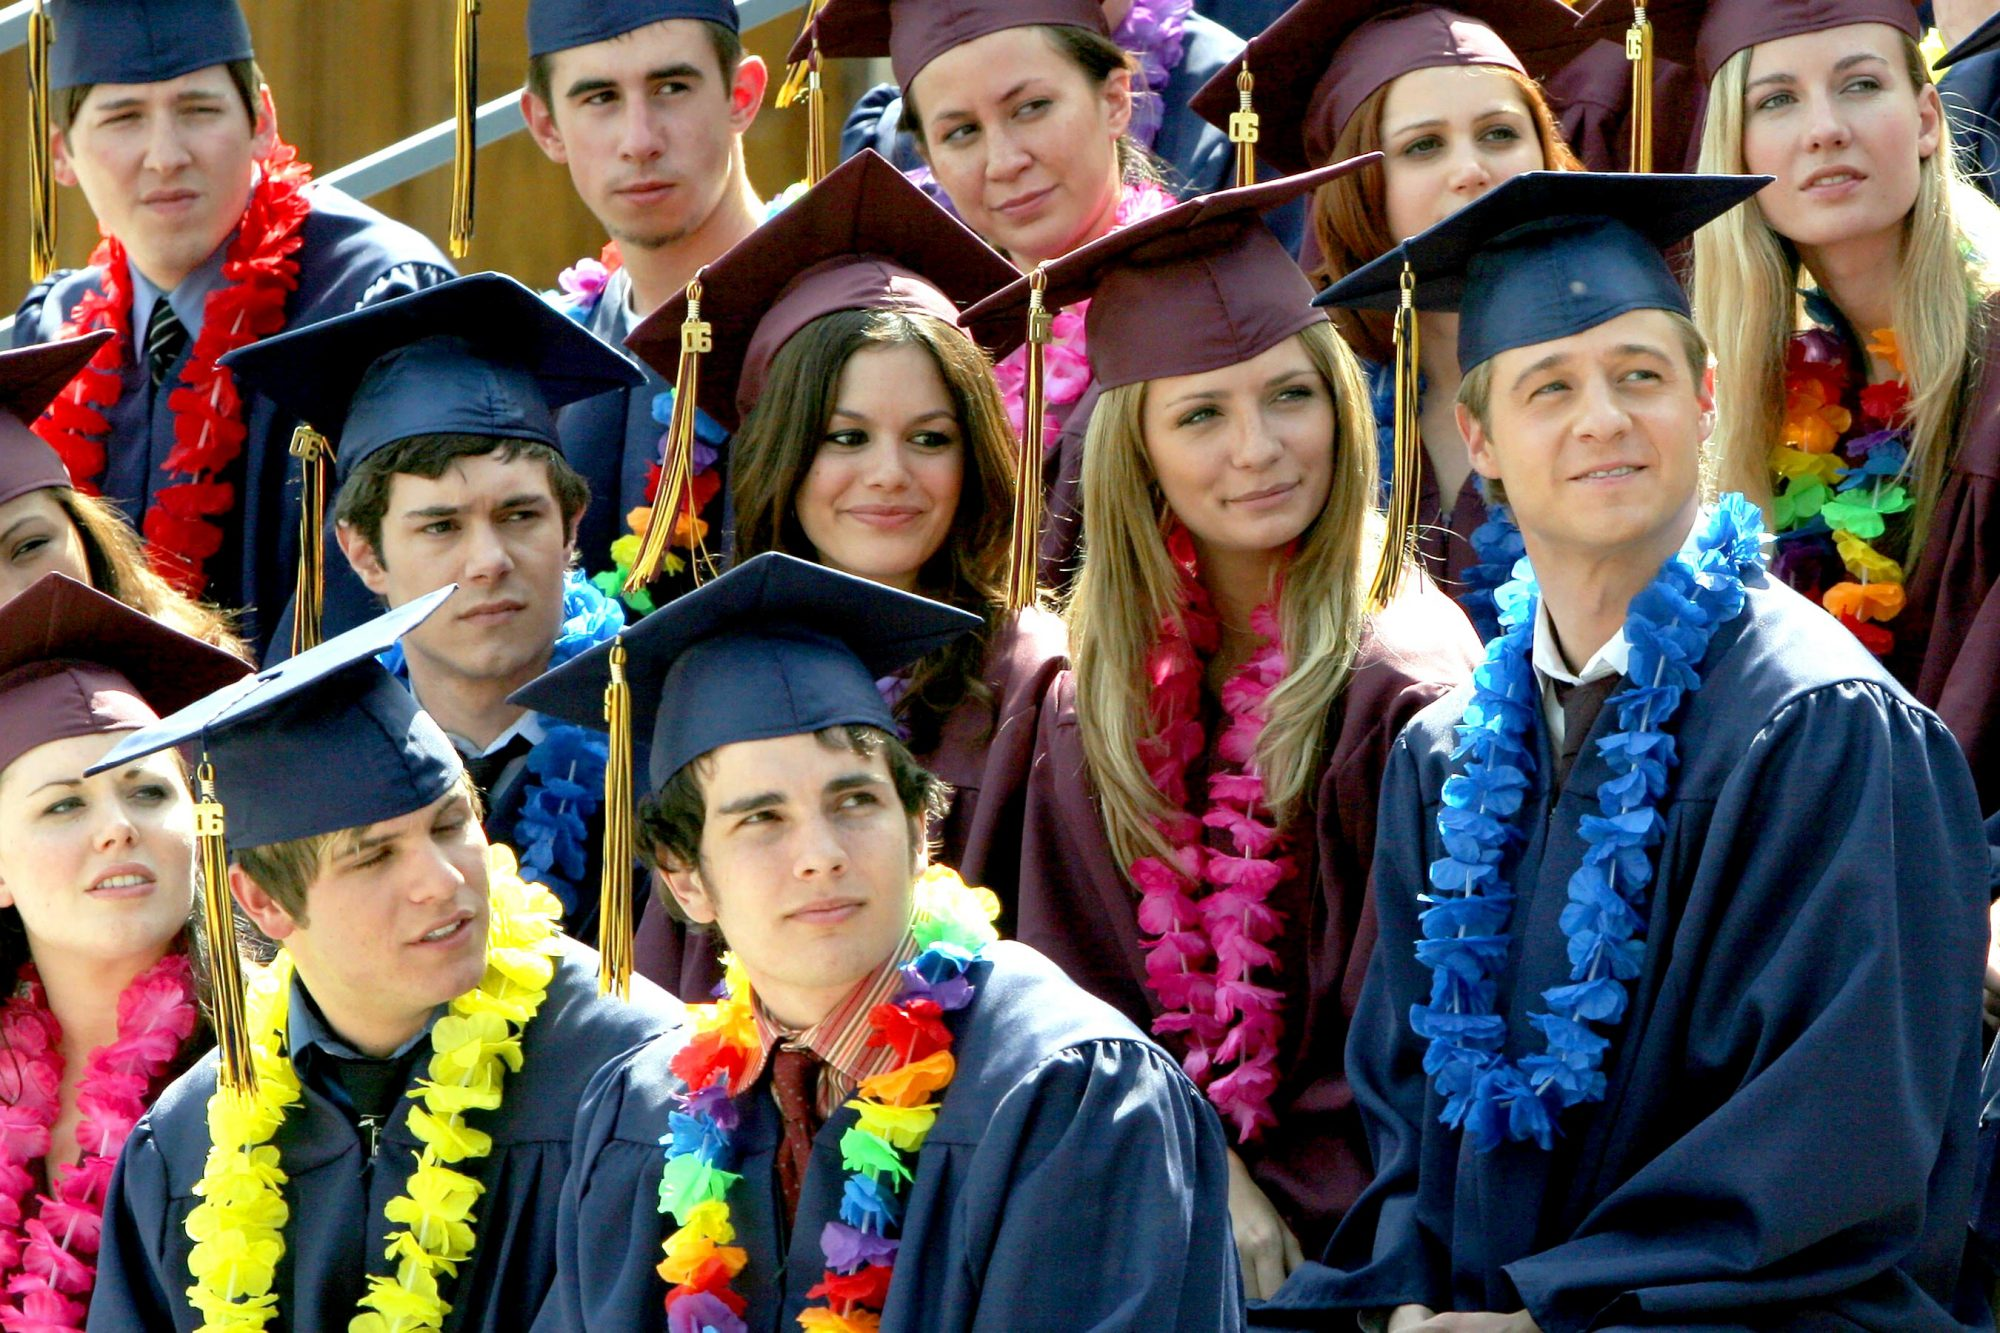 THE O.C., Adam Brody, Rachel Bilson, Mischa Barton, Benjamin McKenzie, 'The Graduates', (Season 3, a